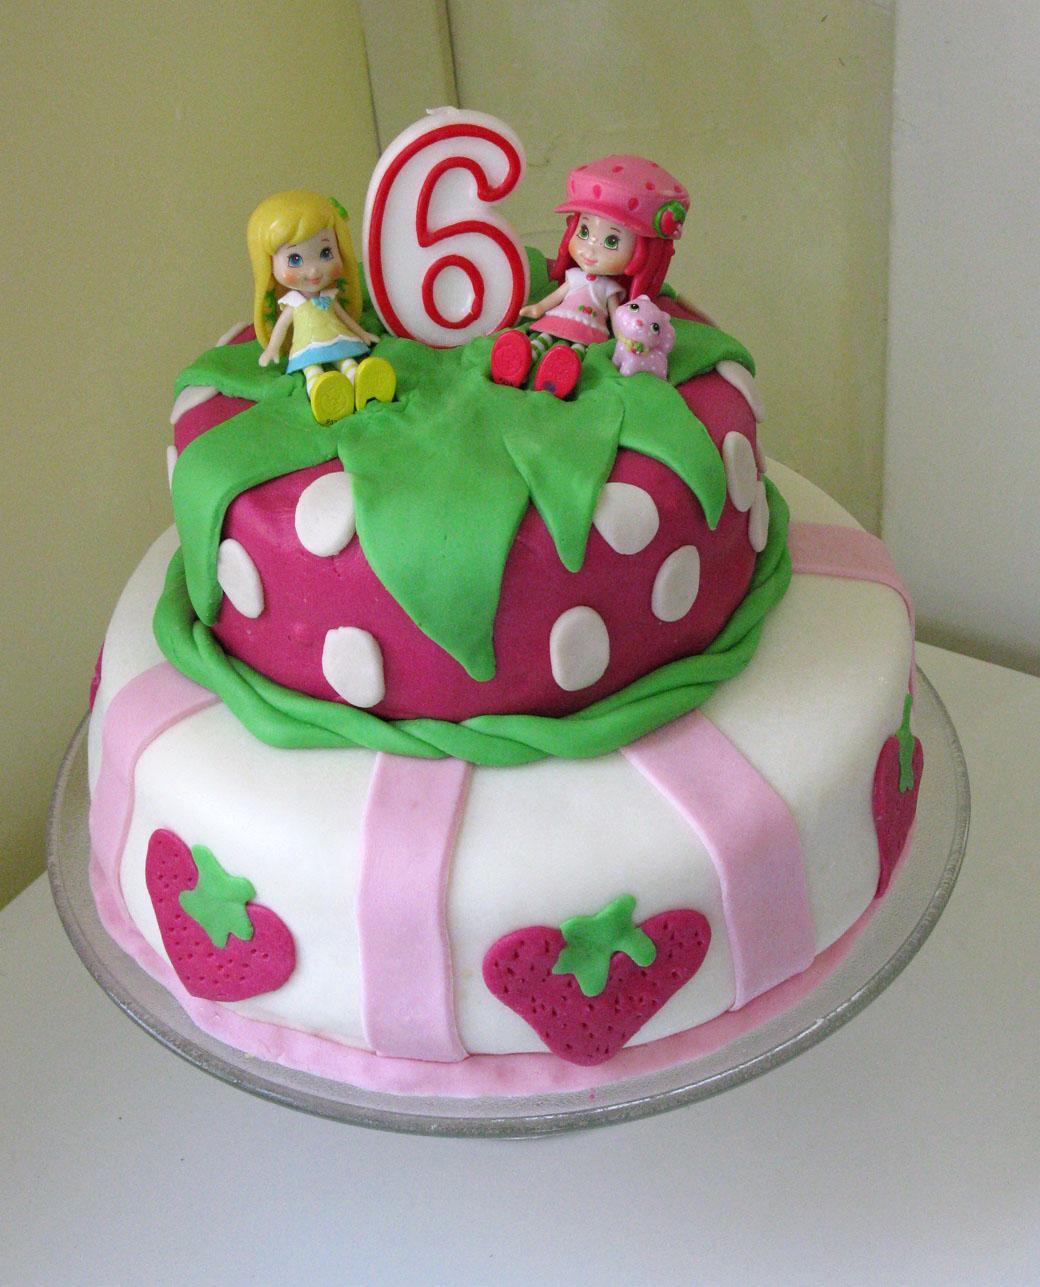 6th Birthday Cakes